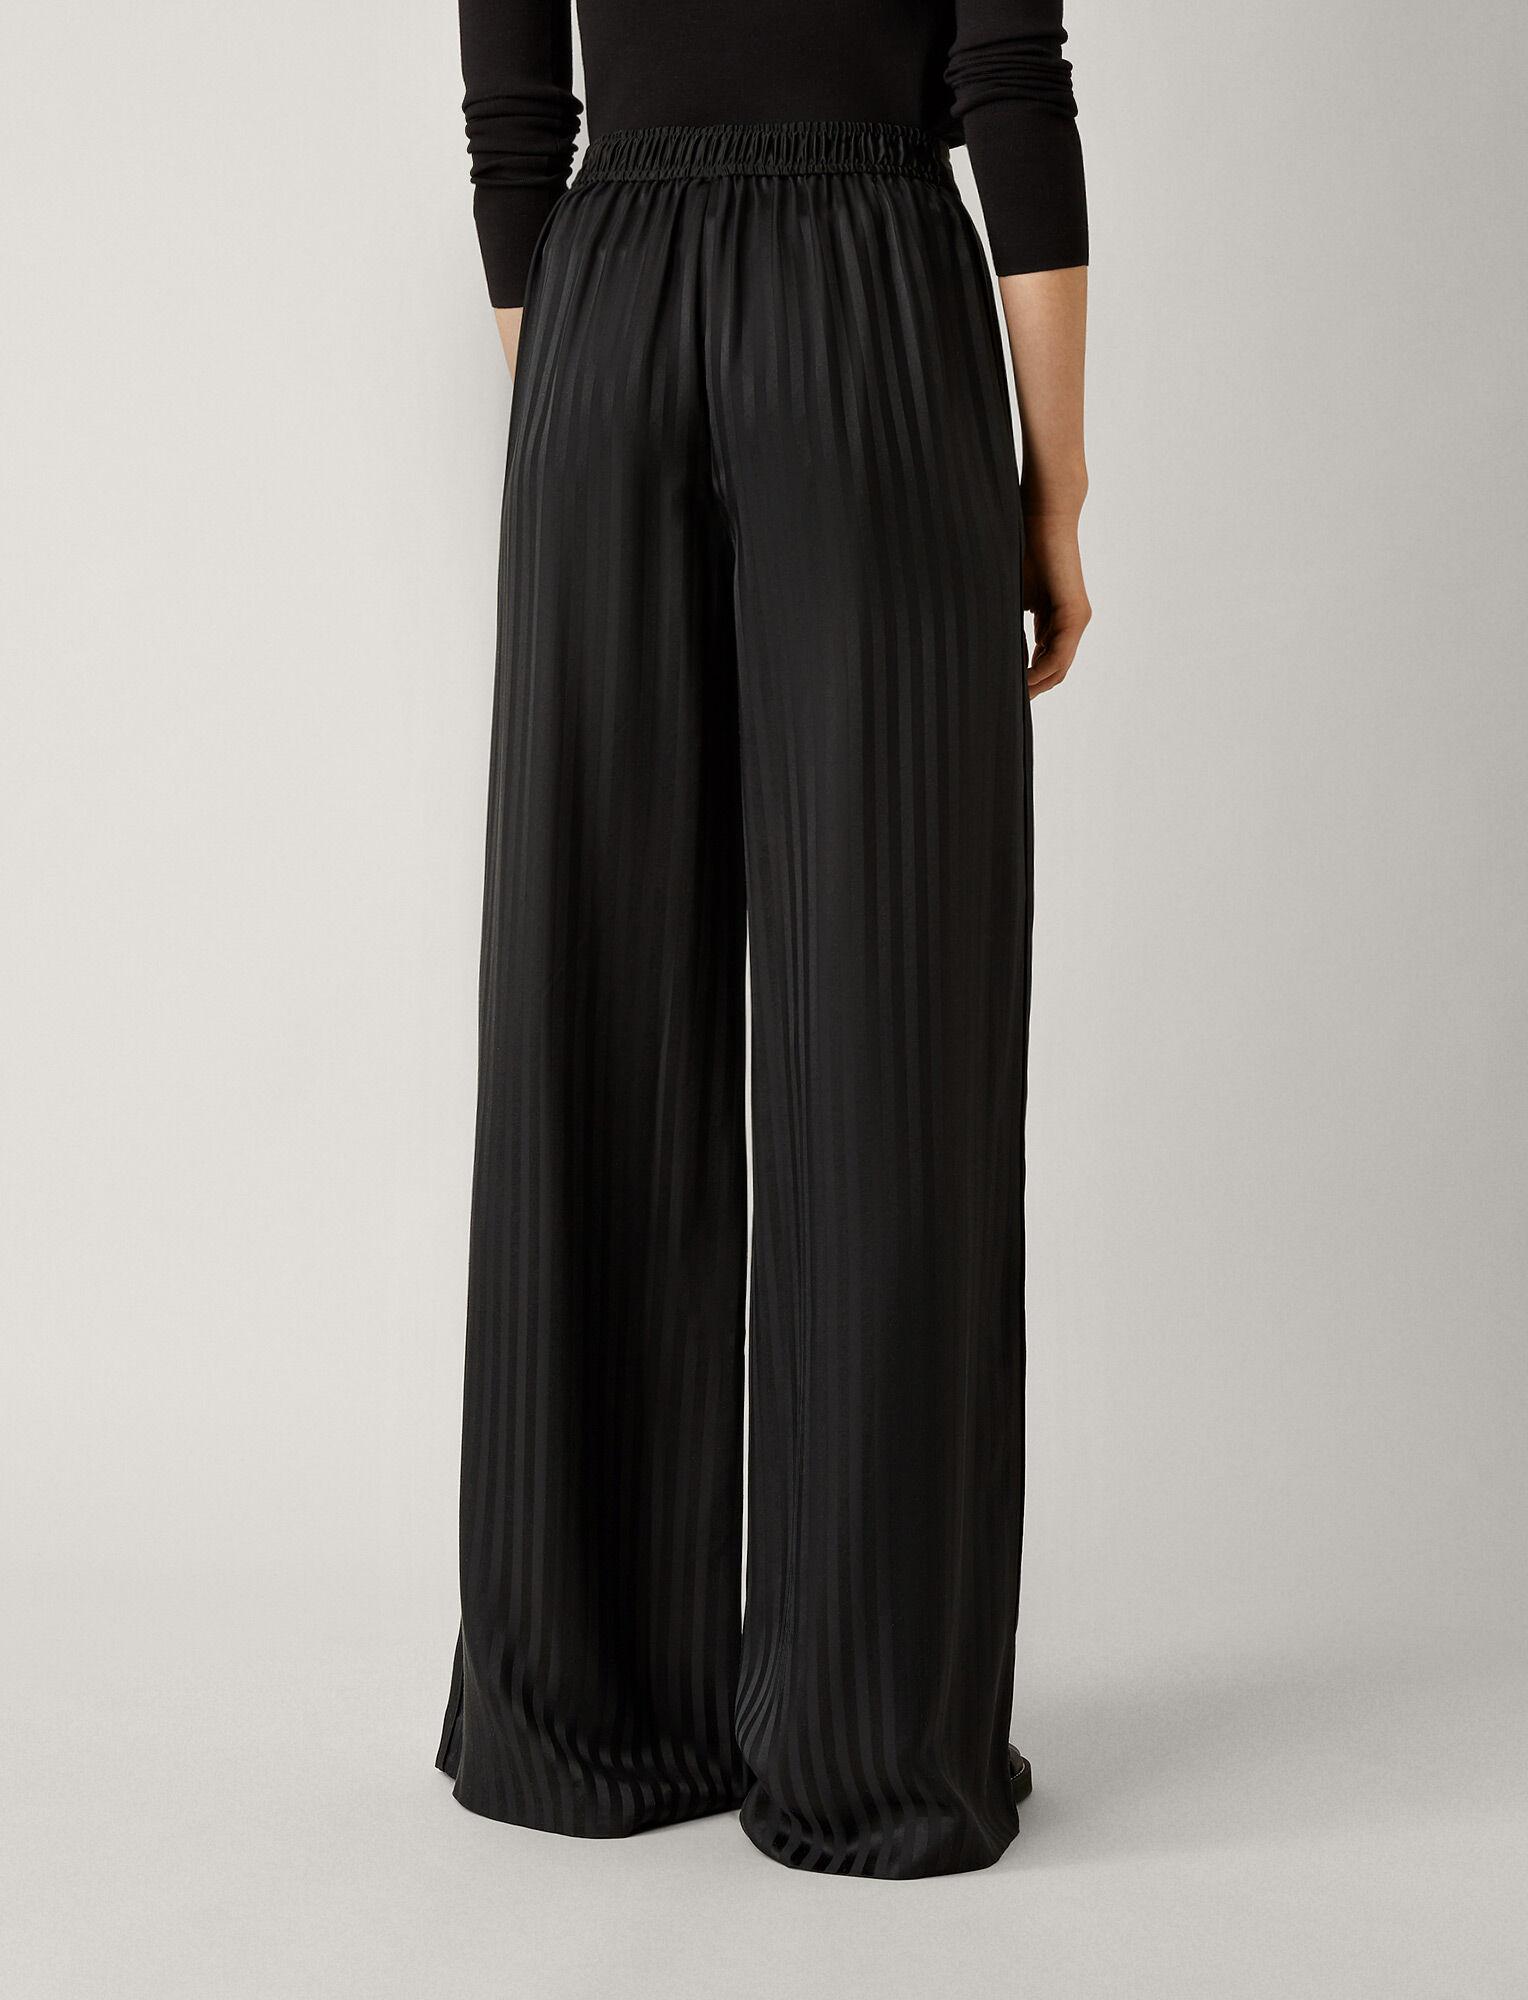 Joseph, Mawn Pyjama Silk Jacquard Trousers, in BLACK